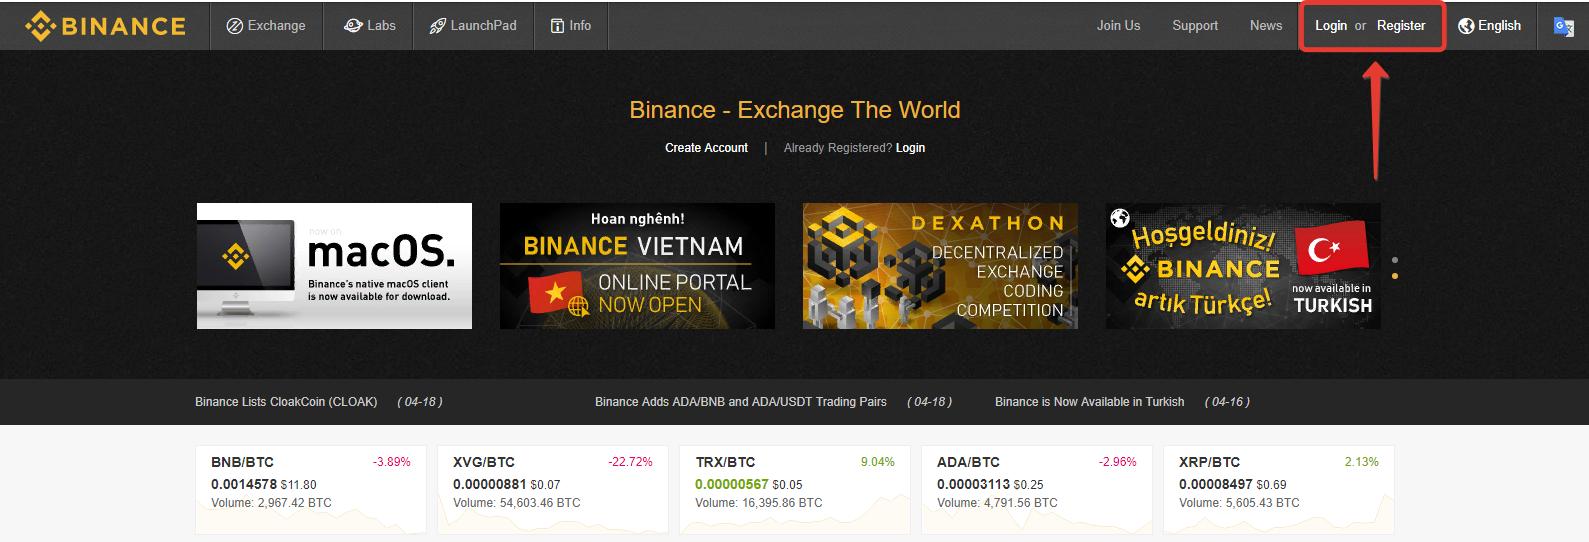 How to create API keys on Binance exchange?